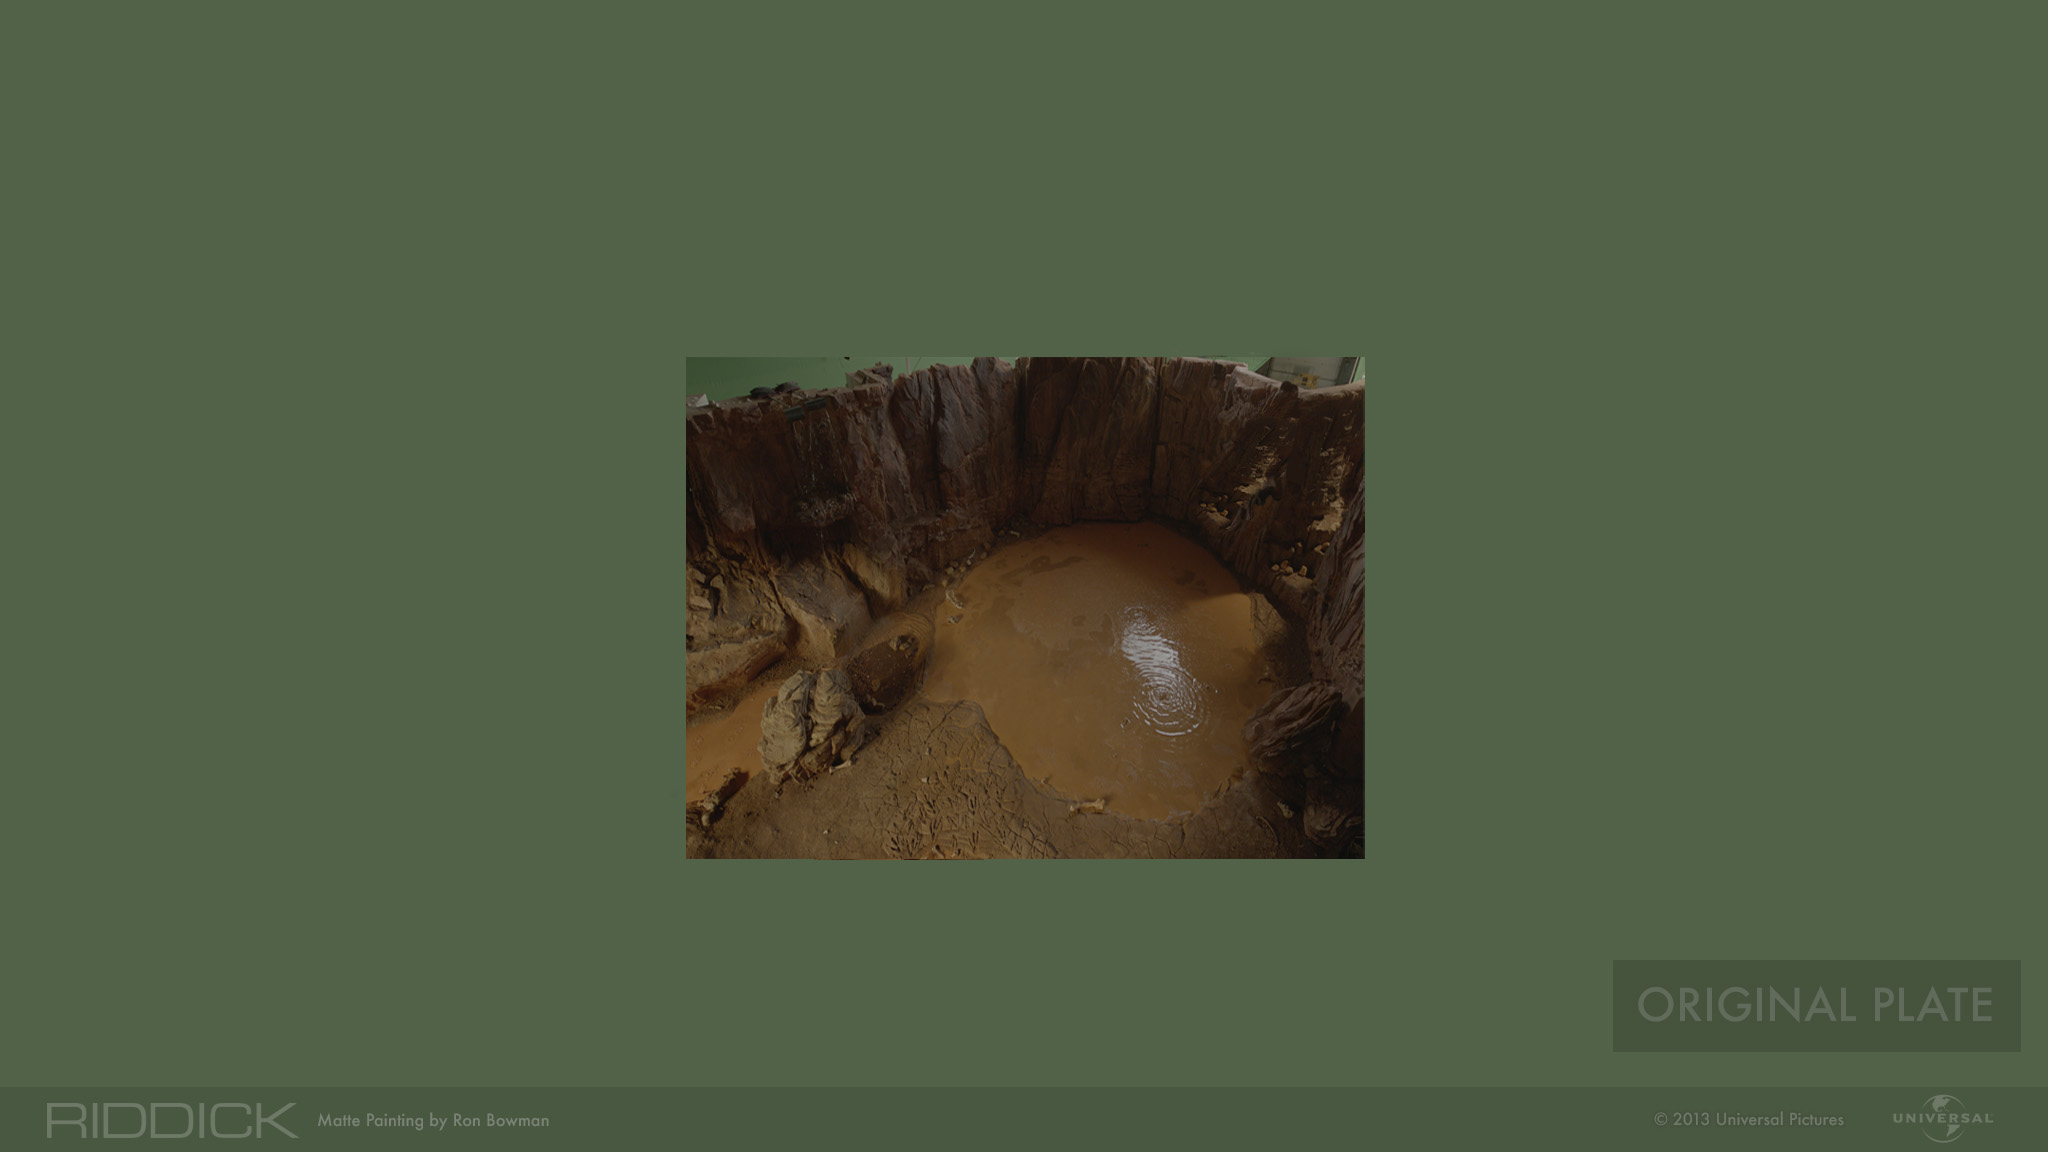 riddick_cave_down_plate.jpg